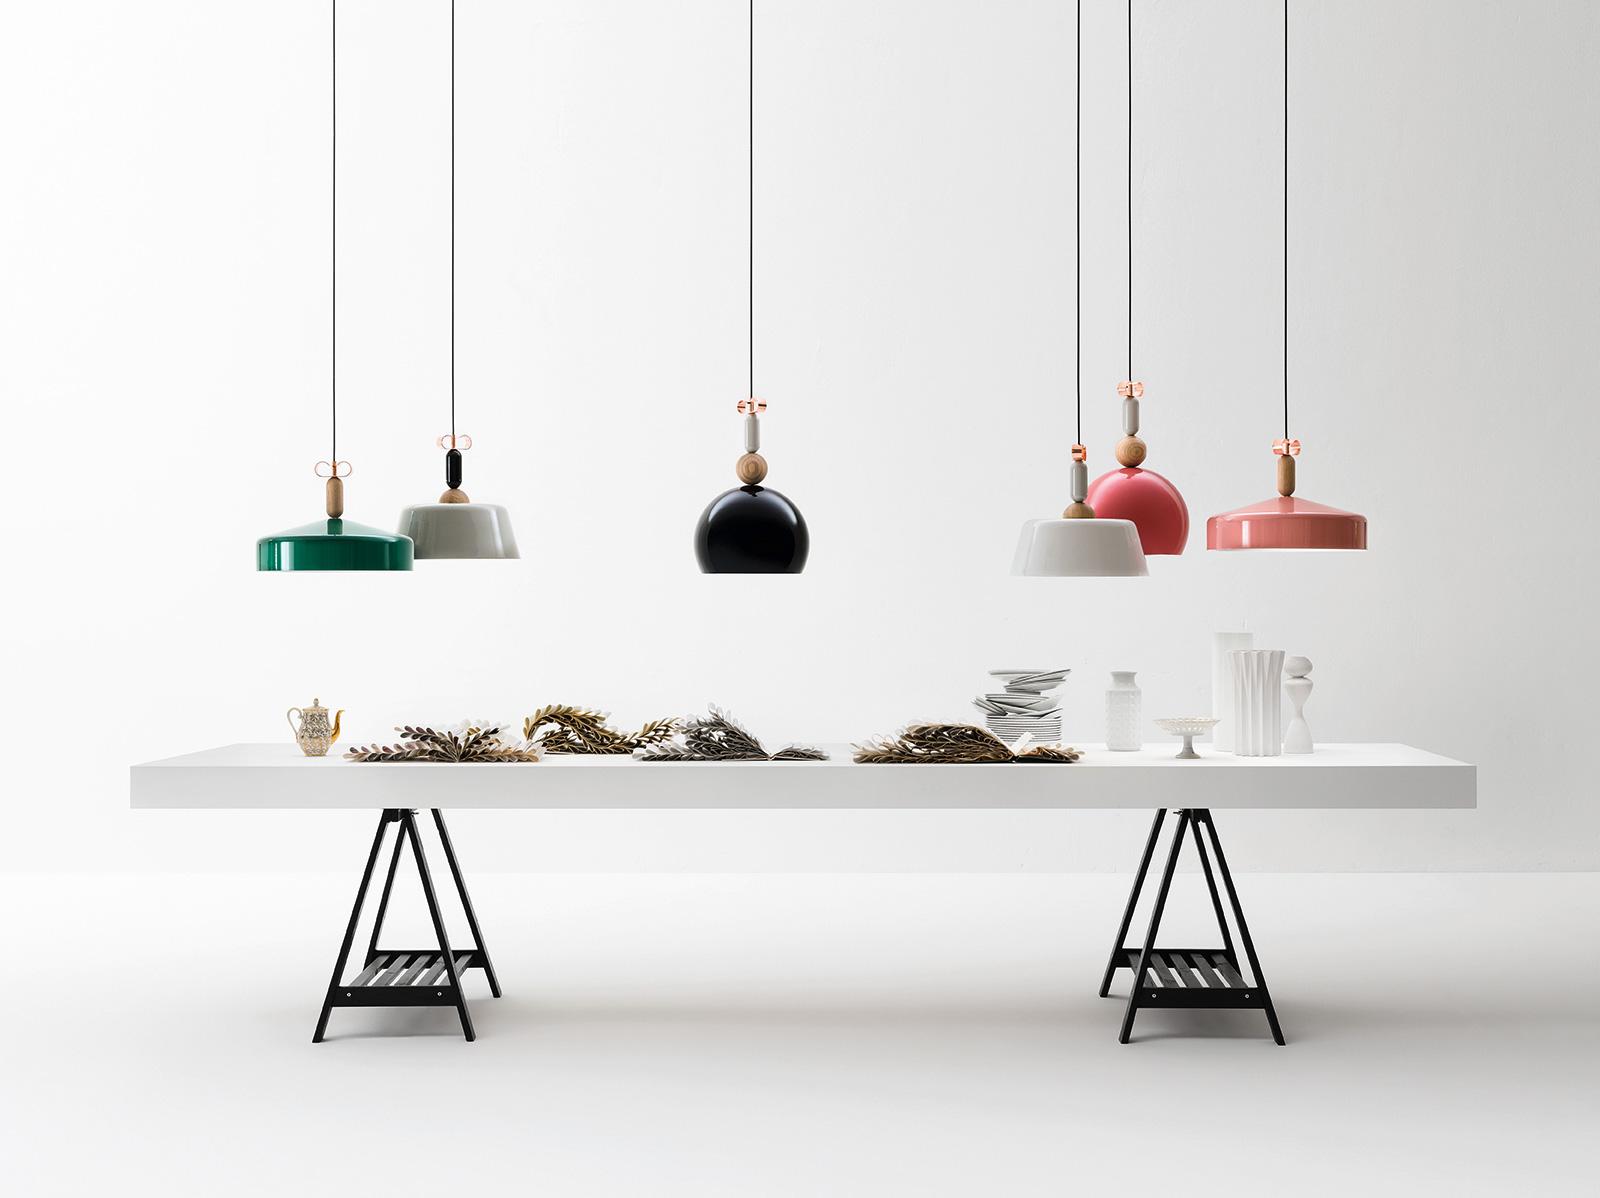 Lampadari cucina living corriere - Cucina lampadari ...